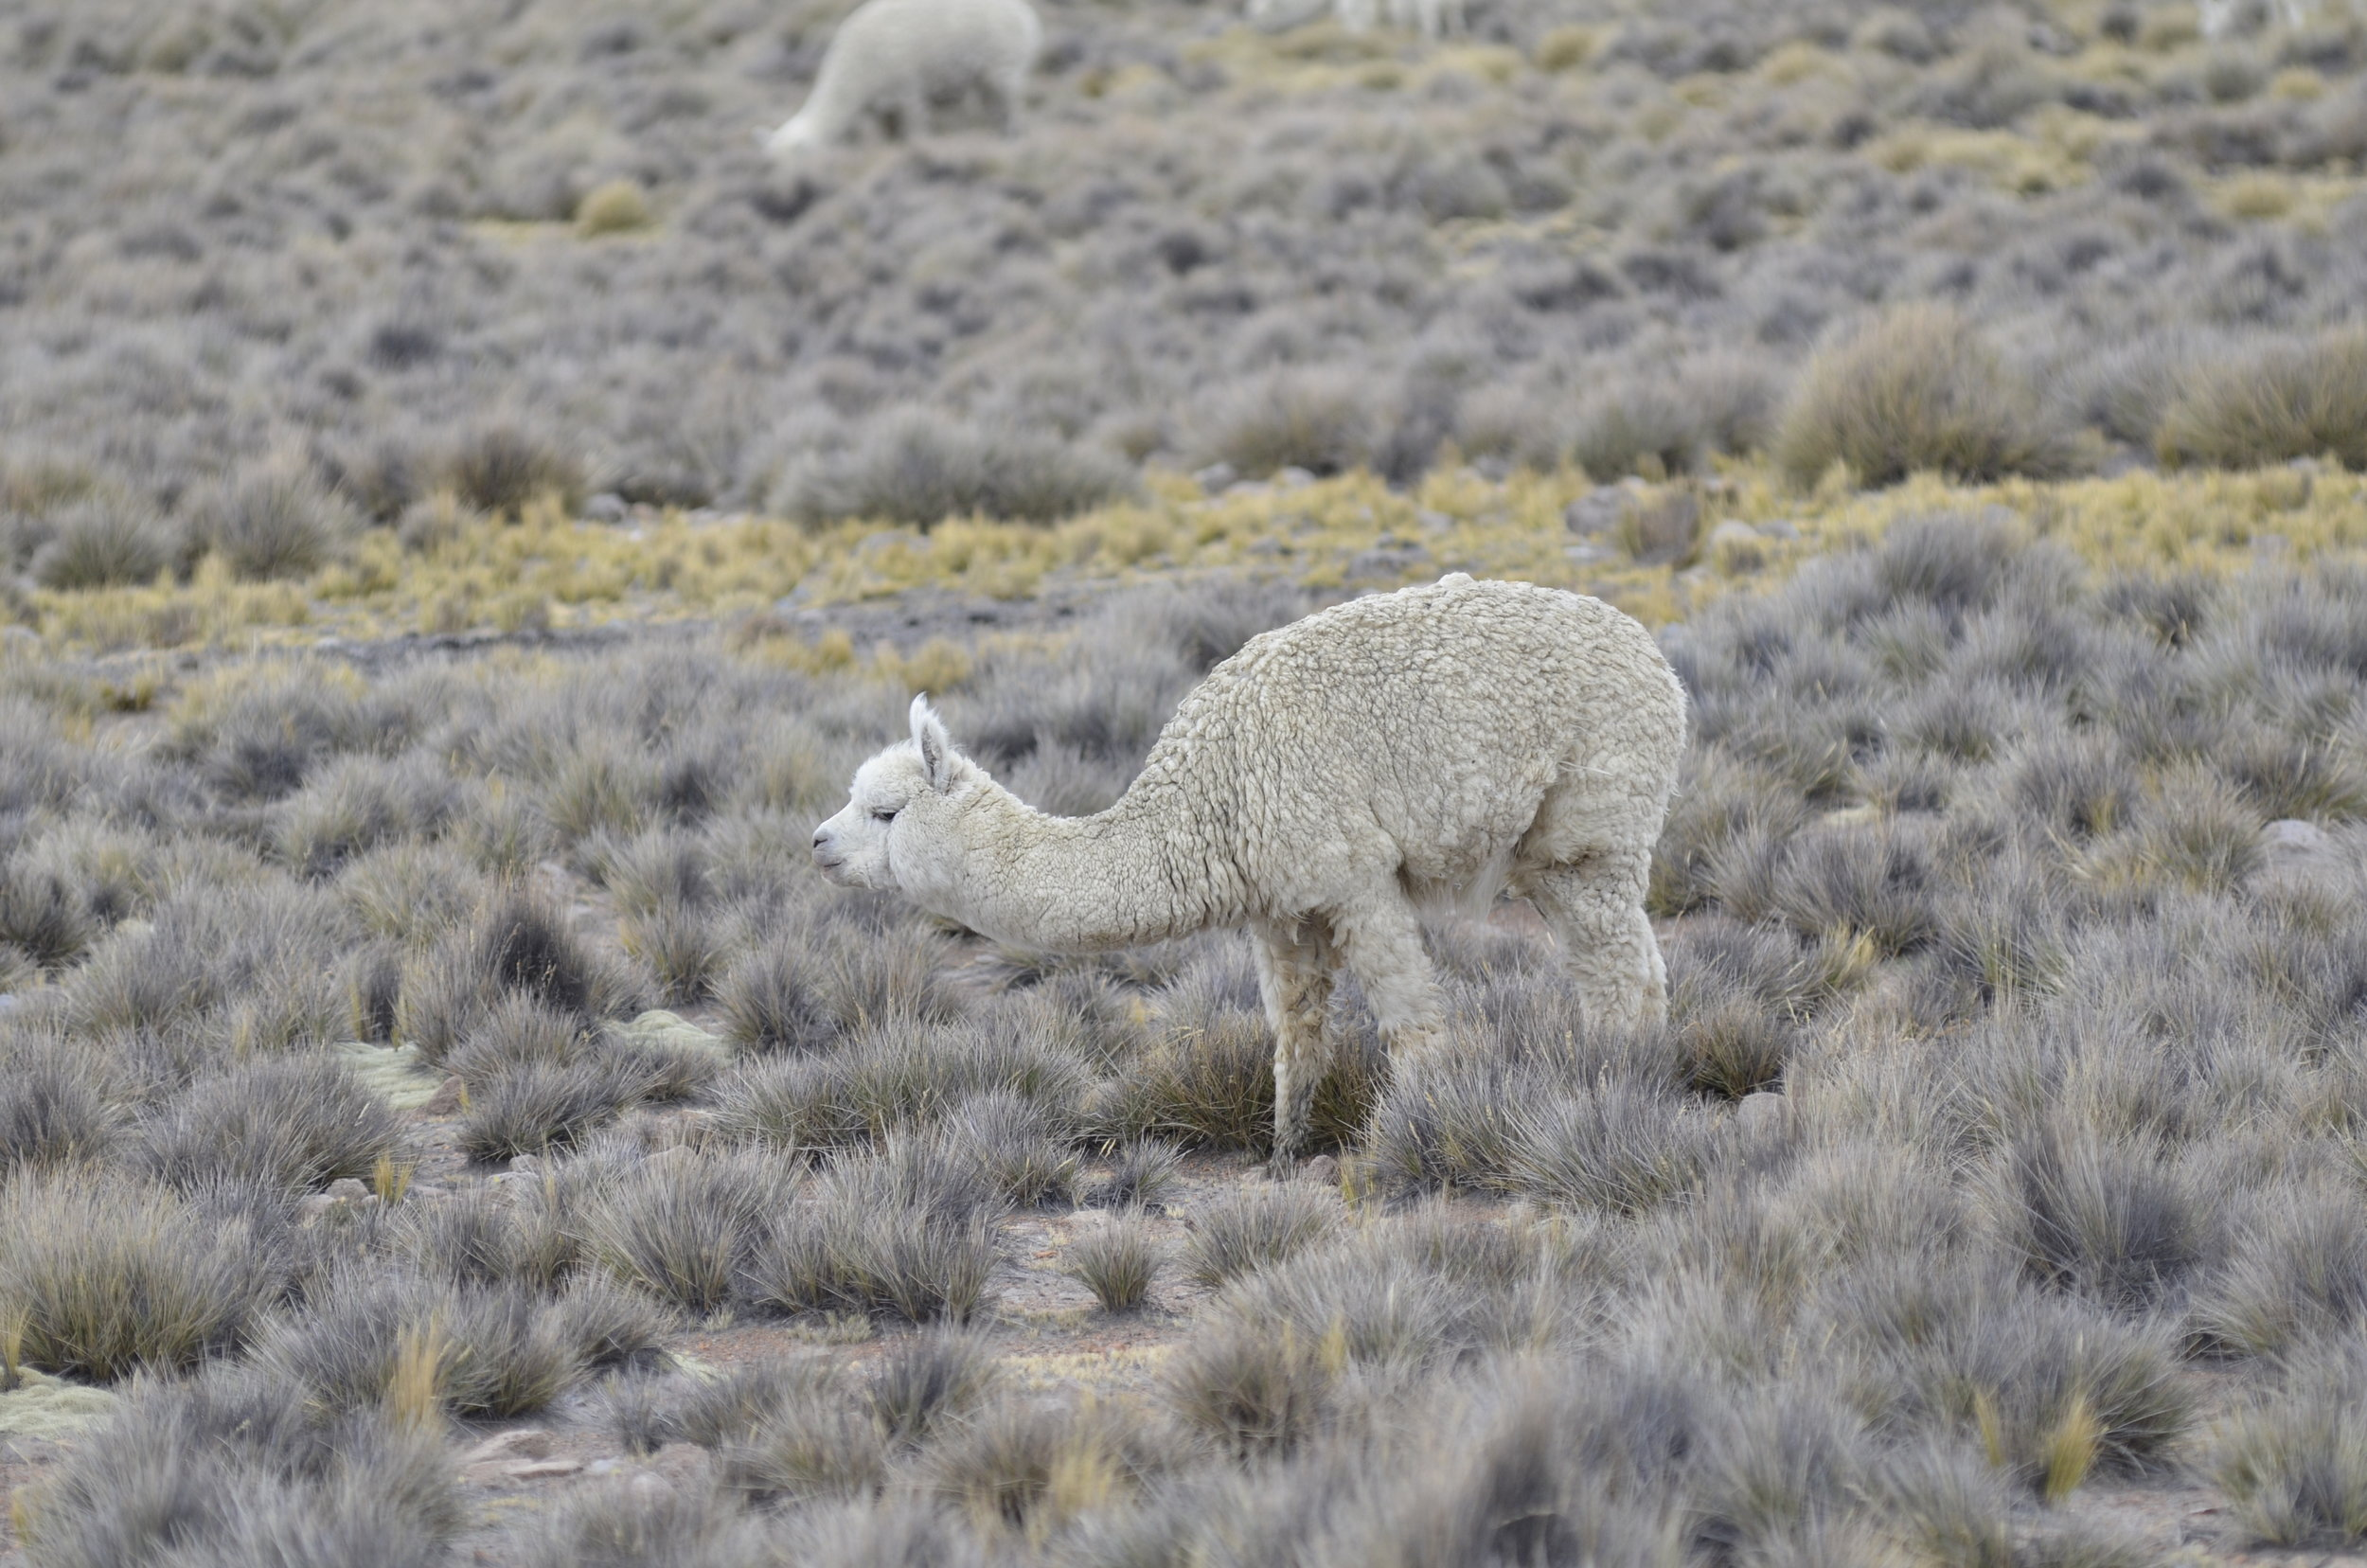 (cute and fuzzy) Alpaca